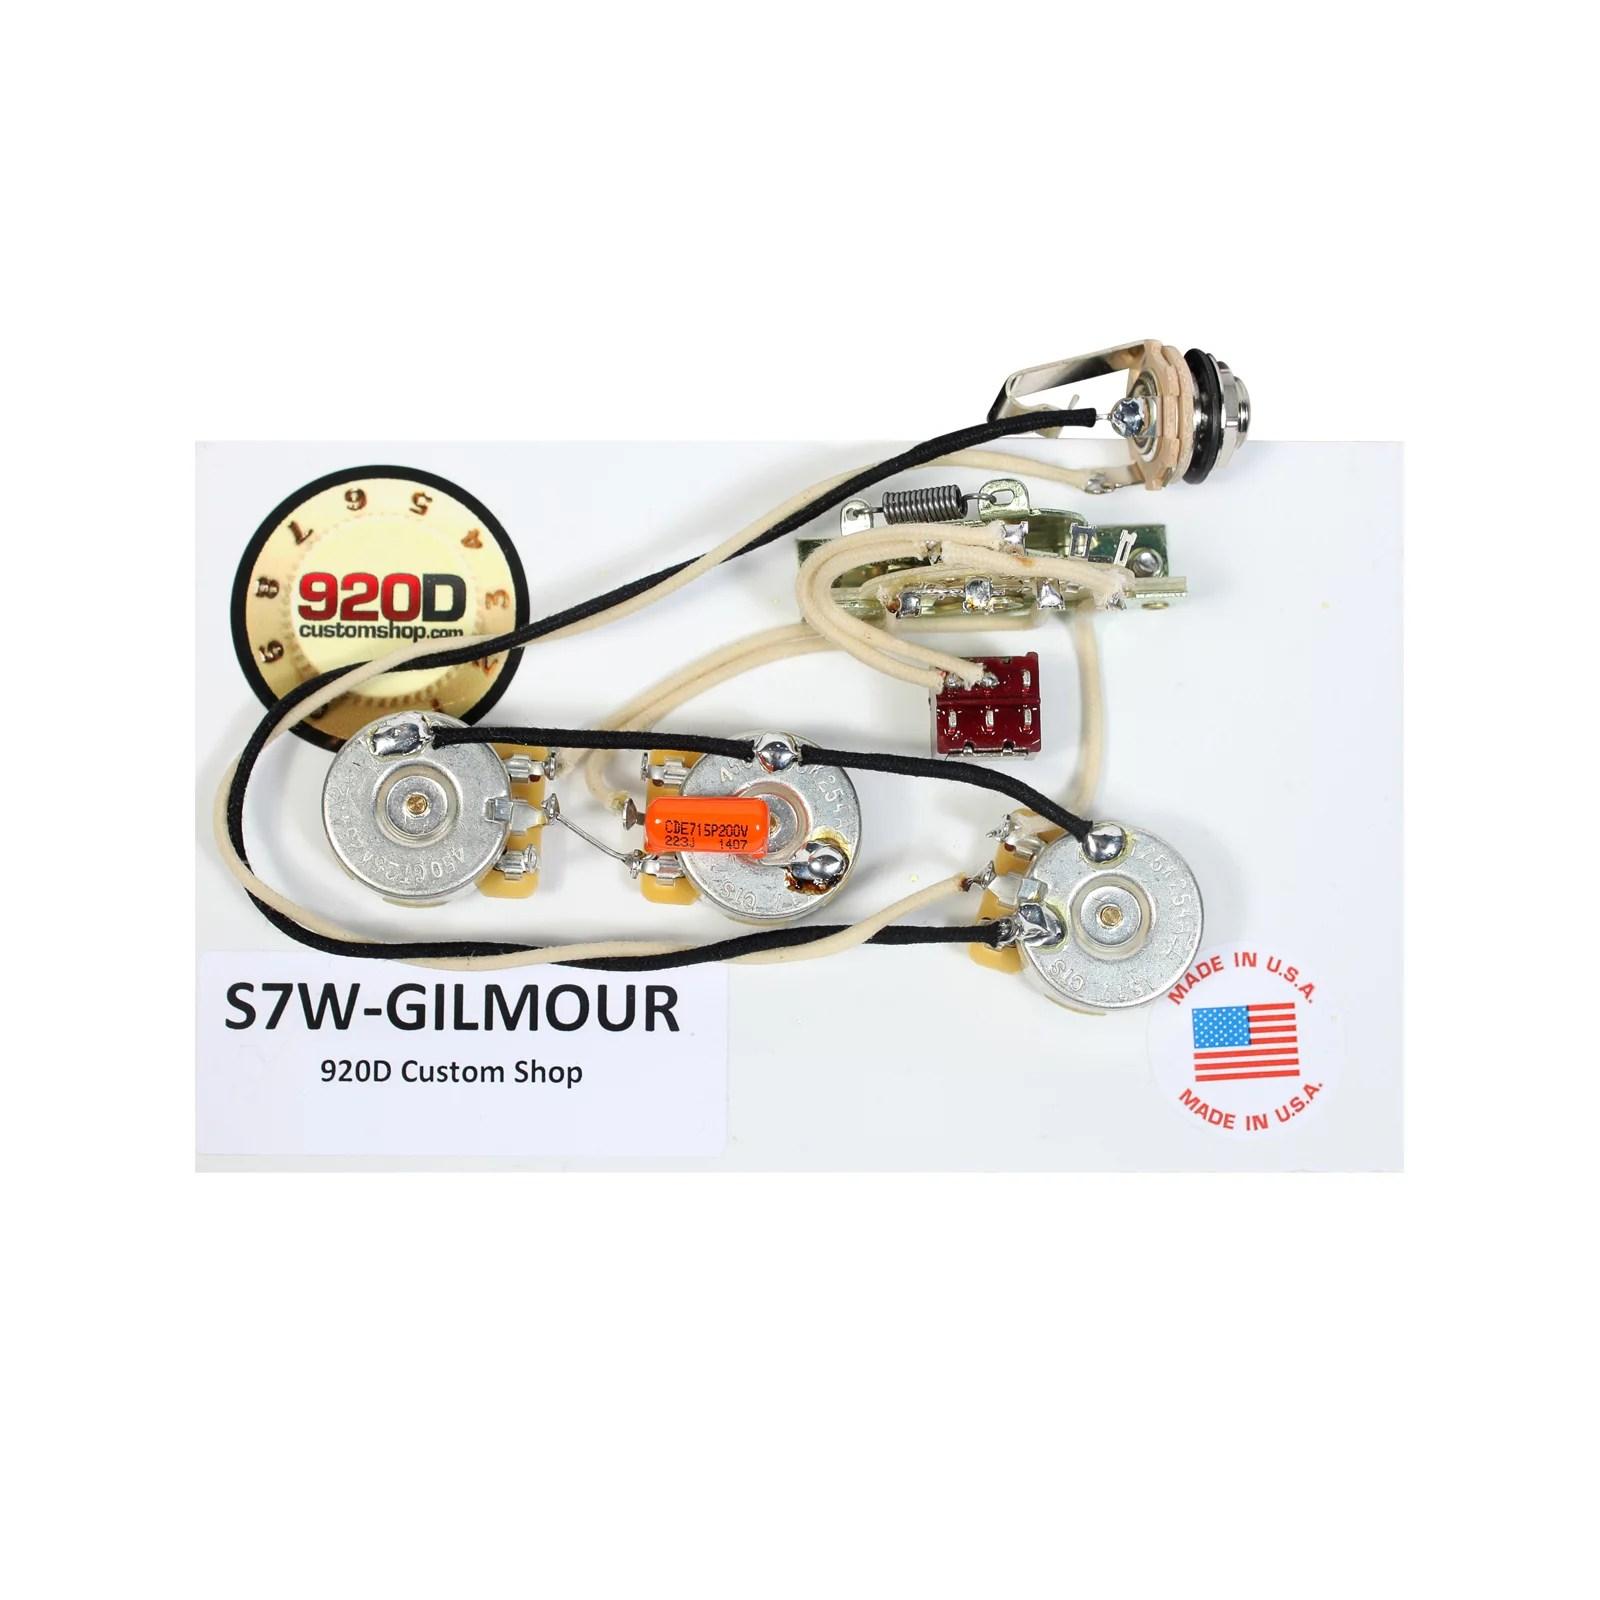 medium resolution of fender strat stratocaster david gilmour 7 way wiring harness mini fender strat stratocaster david gilmour 7